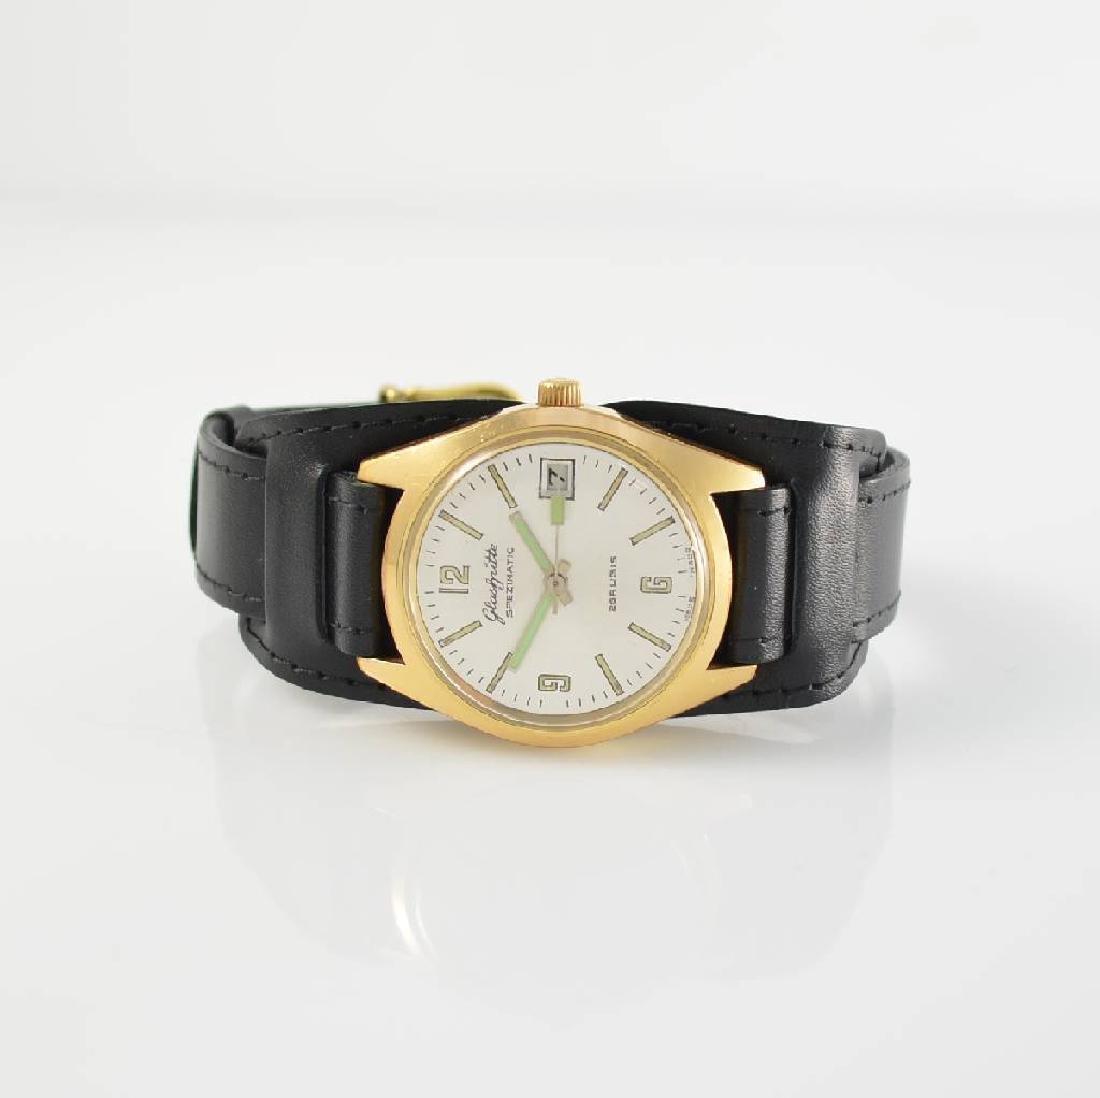 GLASHUTTE Spezimatic gents wristwatch